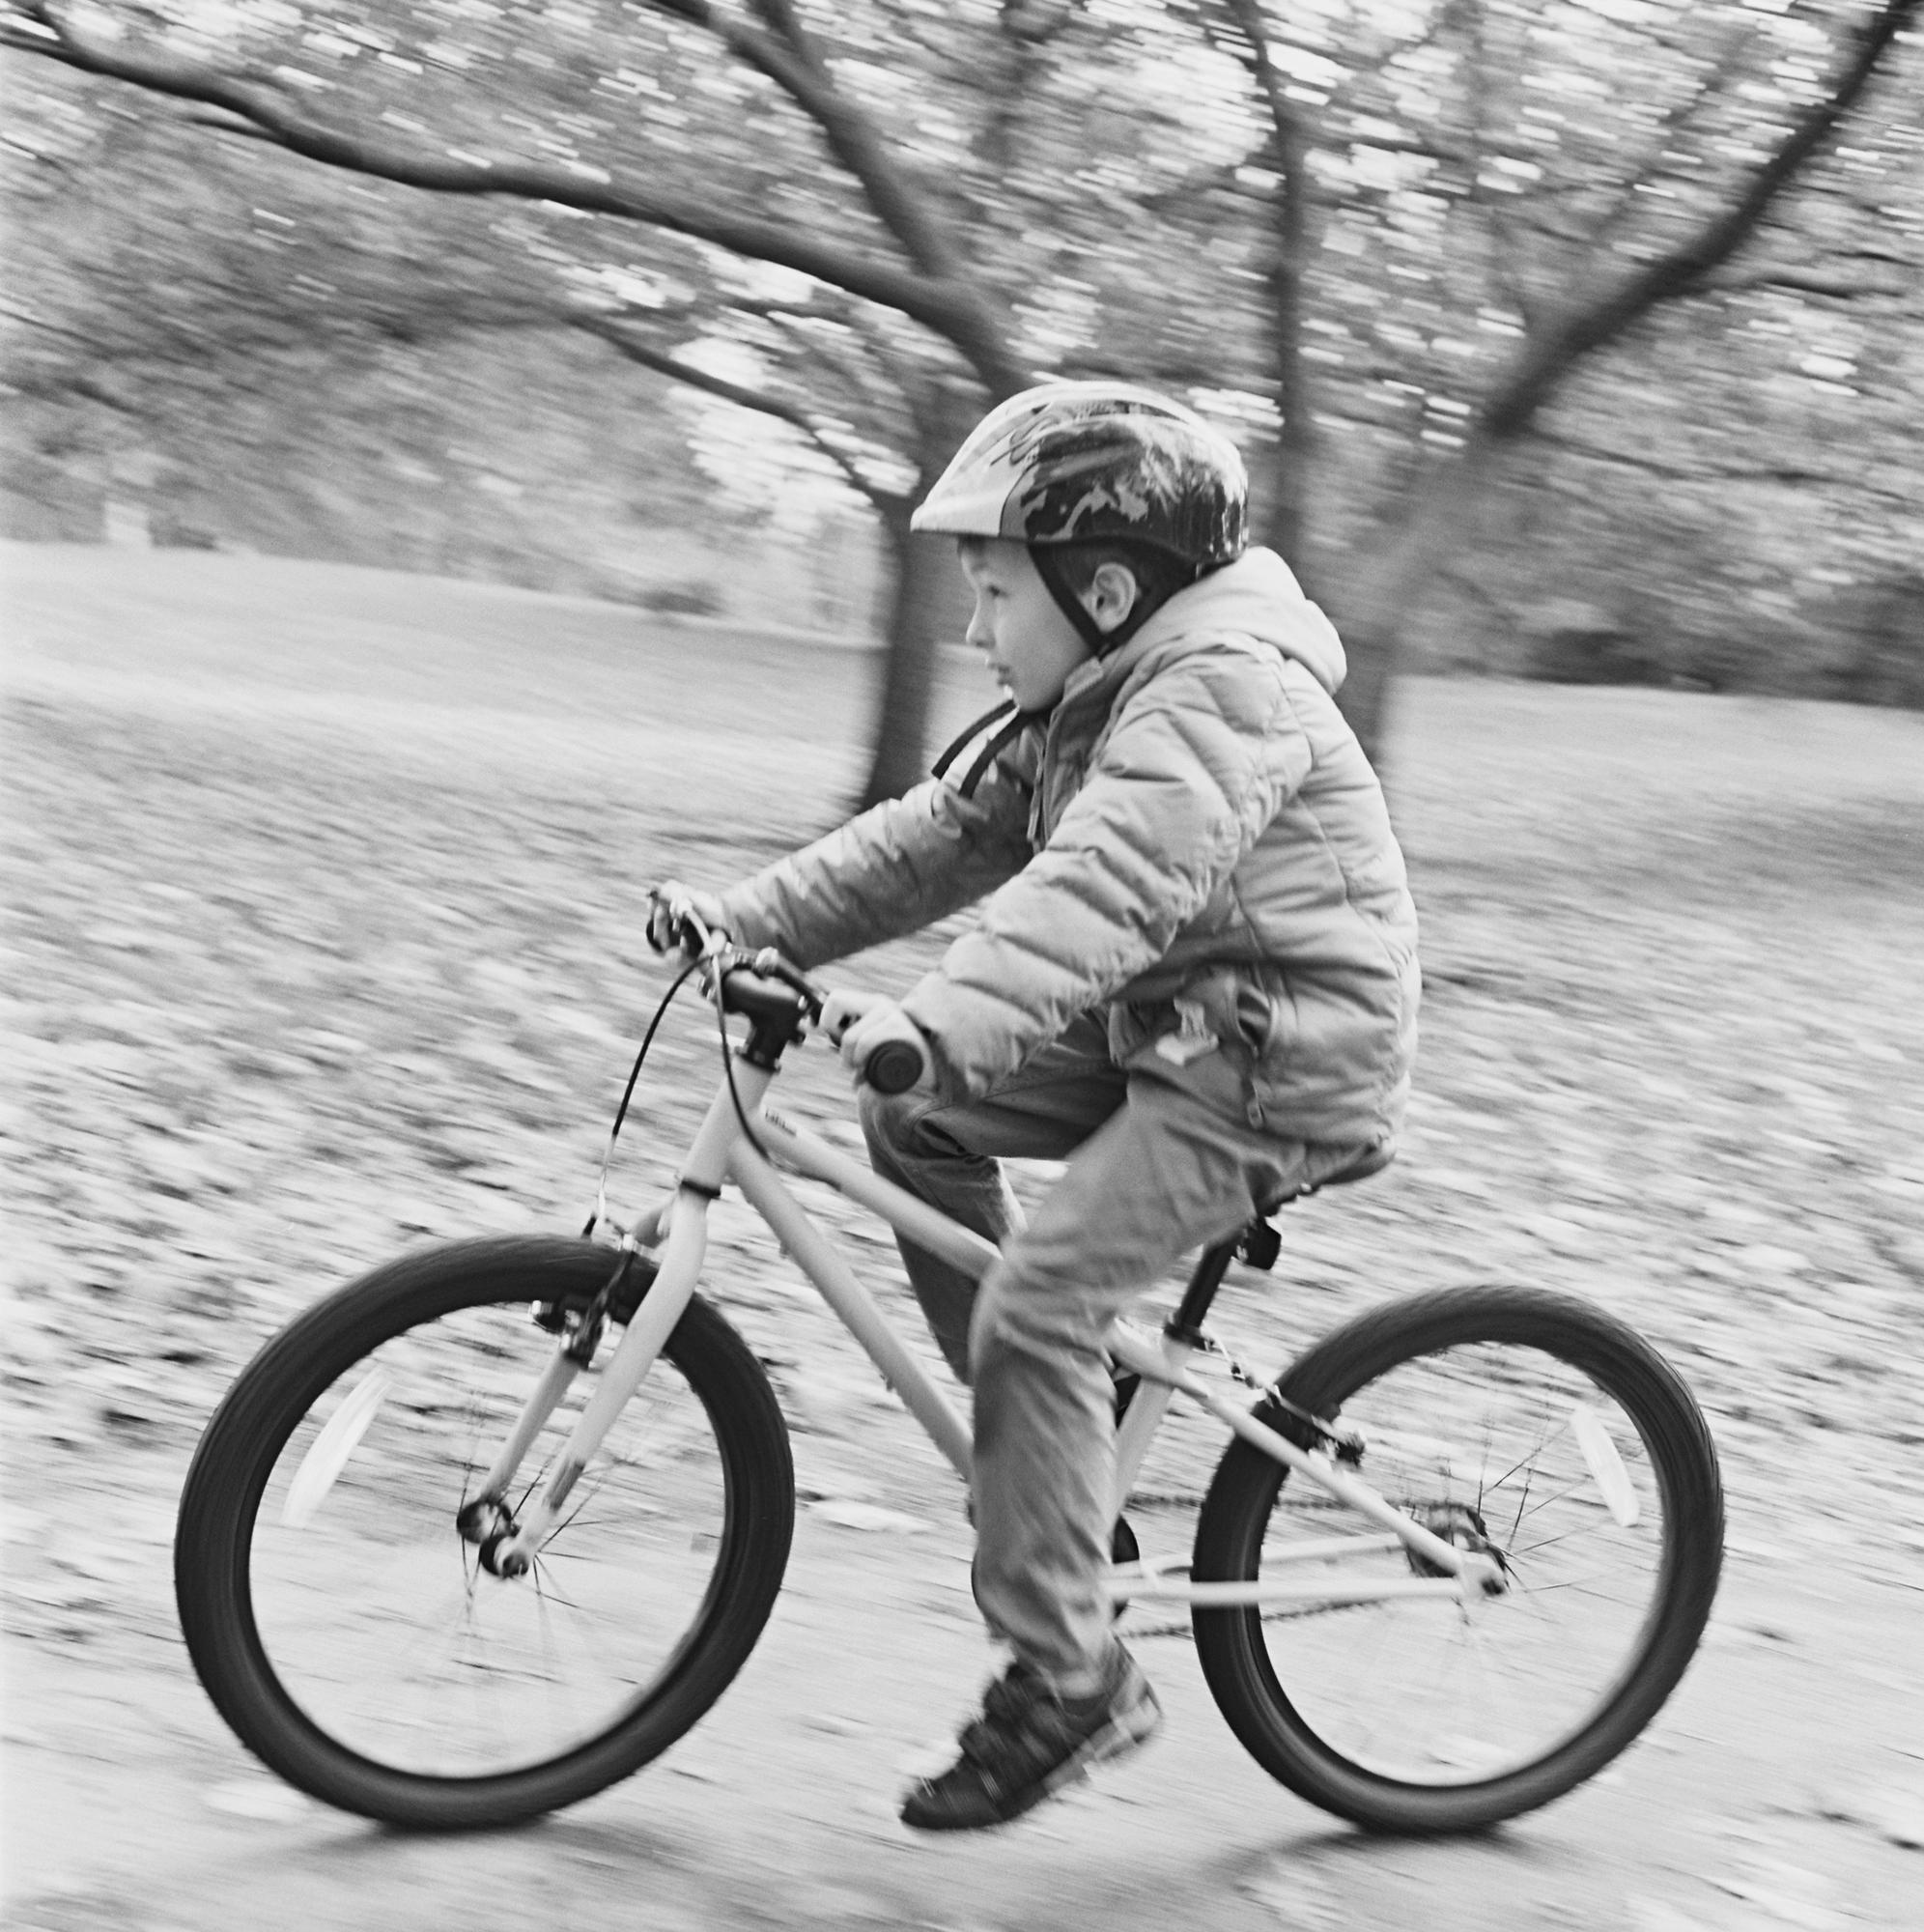 Boy rides bike in Prospect Park, Brooklyn.